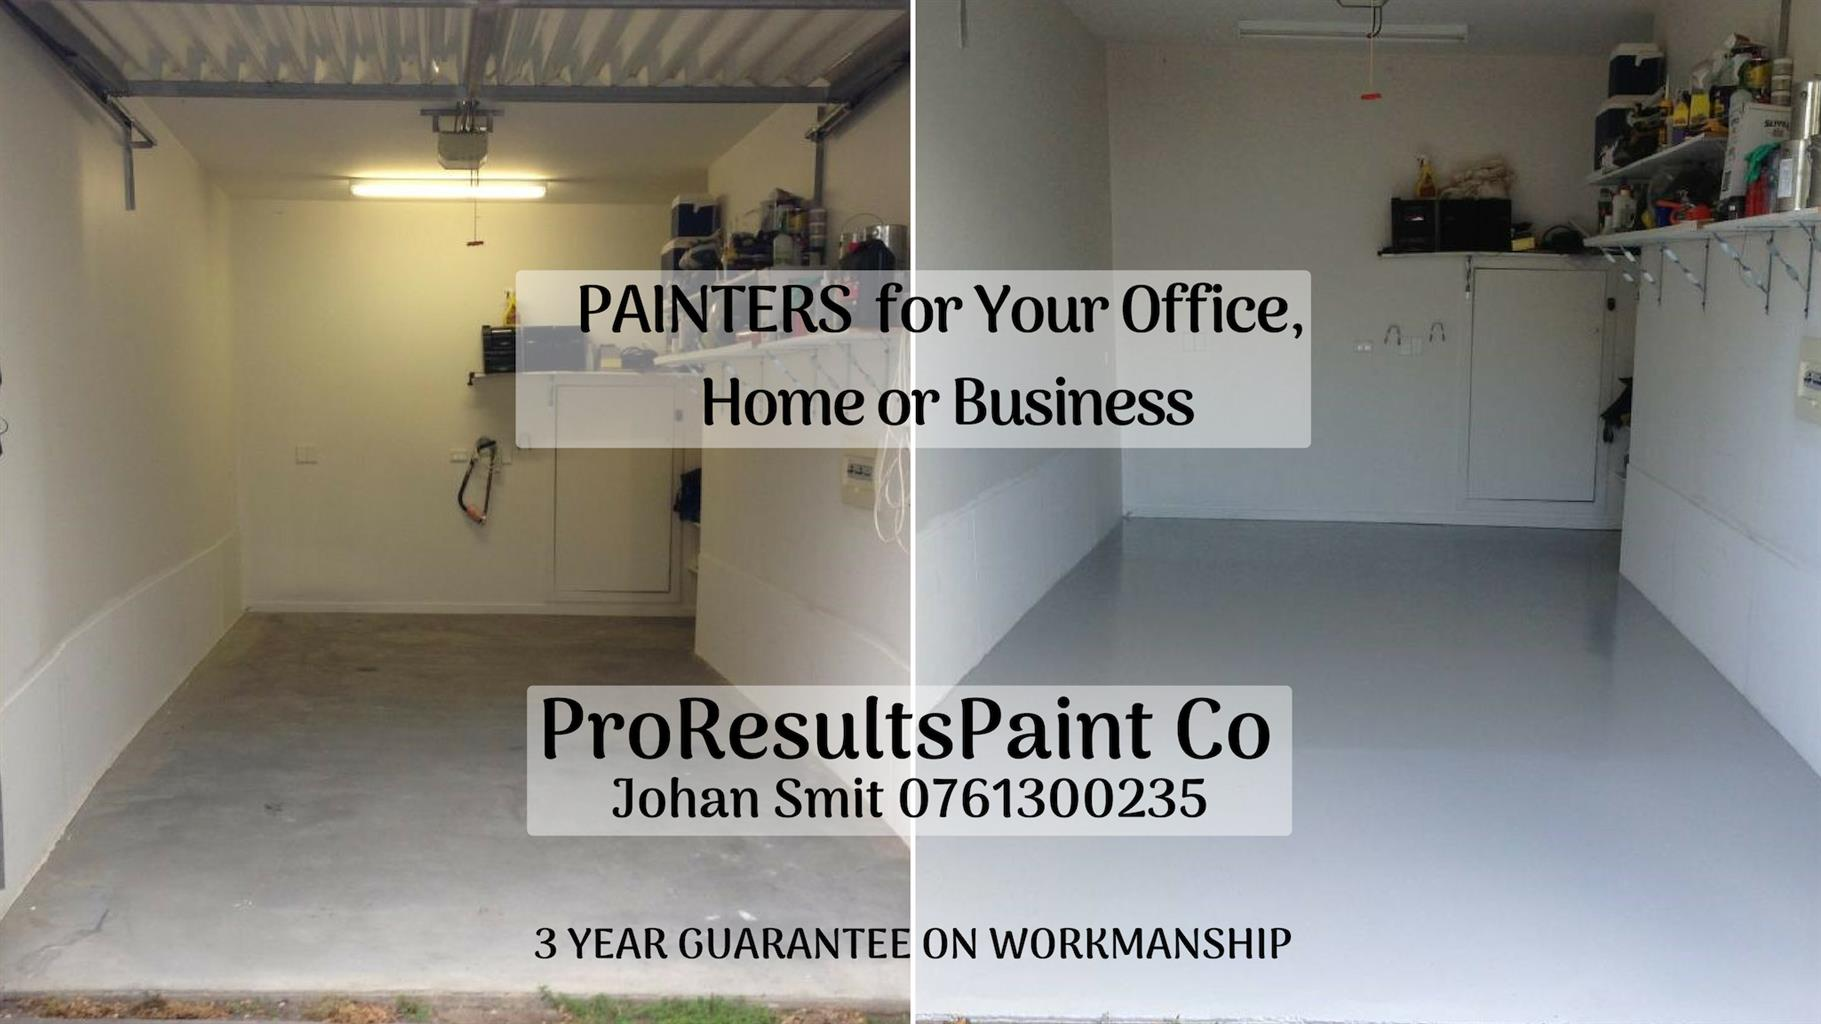 Painting Contractor - Painters - Painter - Paint Contractors - Home Painters - Business Painters - Paint